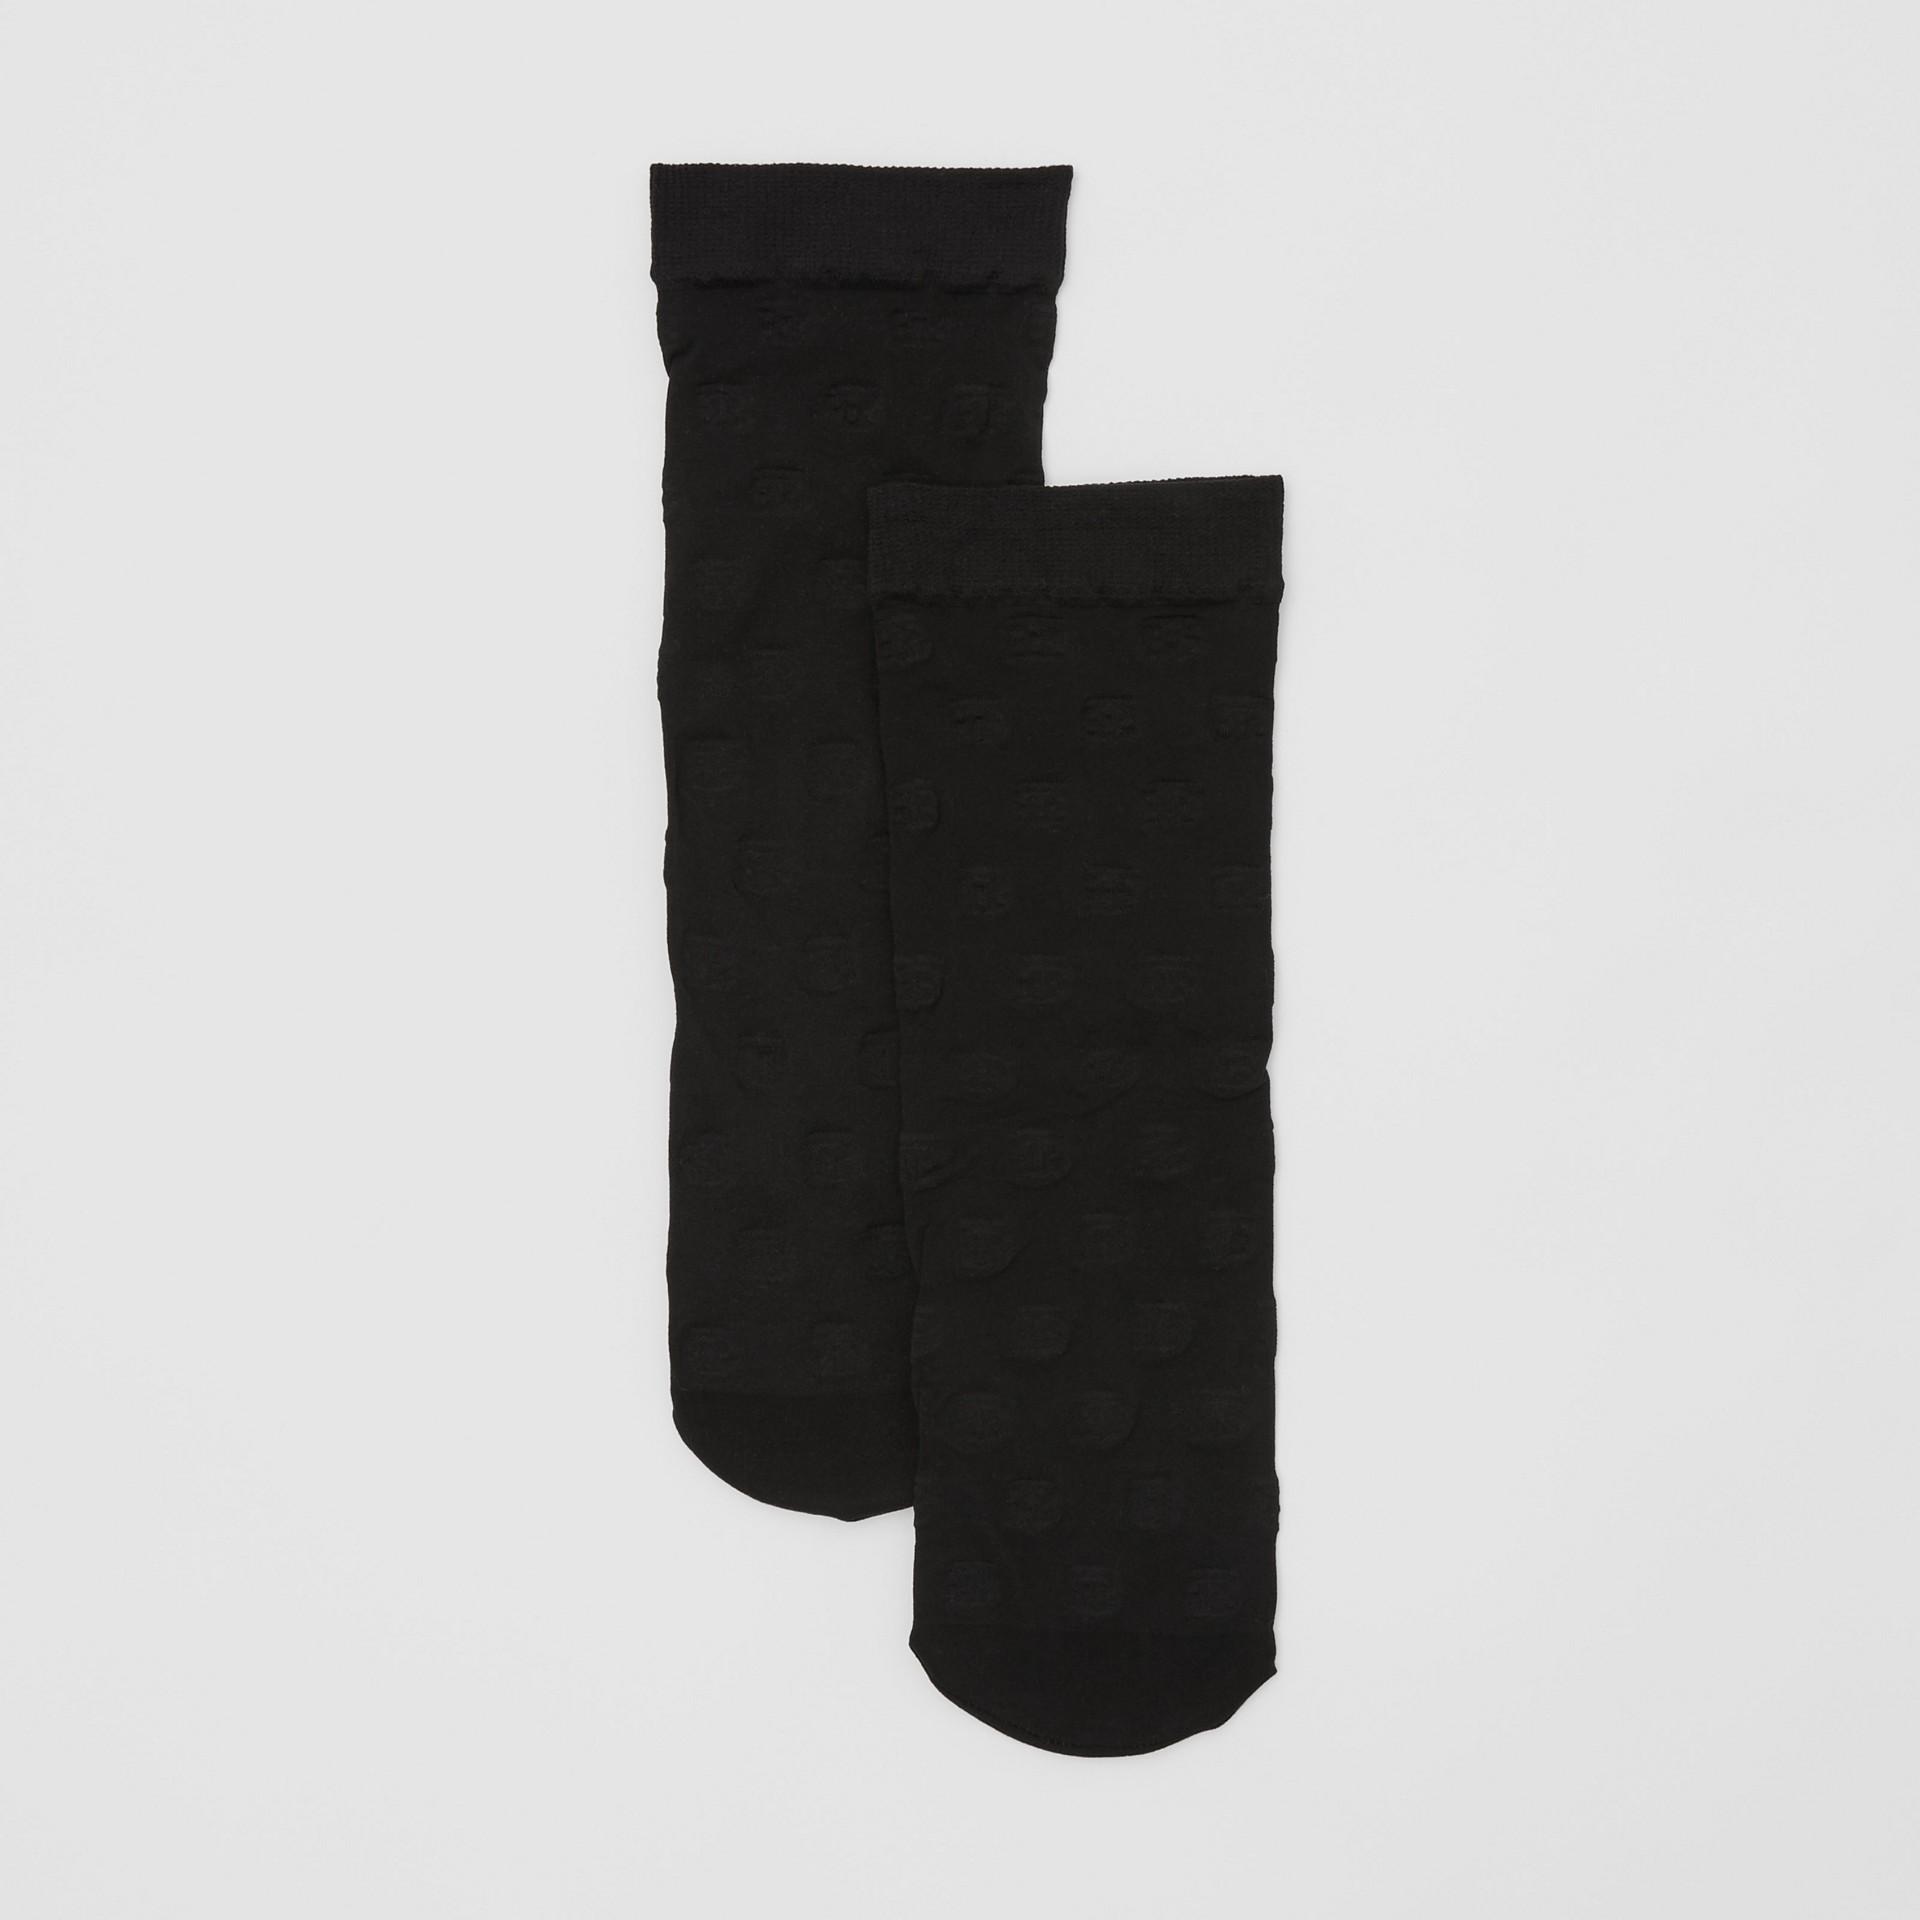 Monogram Motif Socks in Black - Women | Burberry - gallery image 2